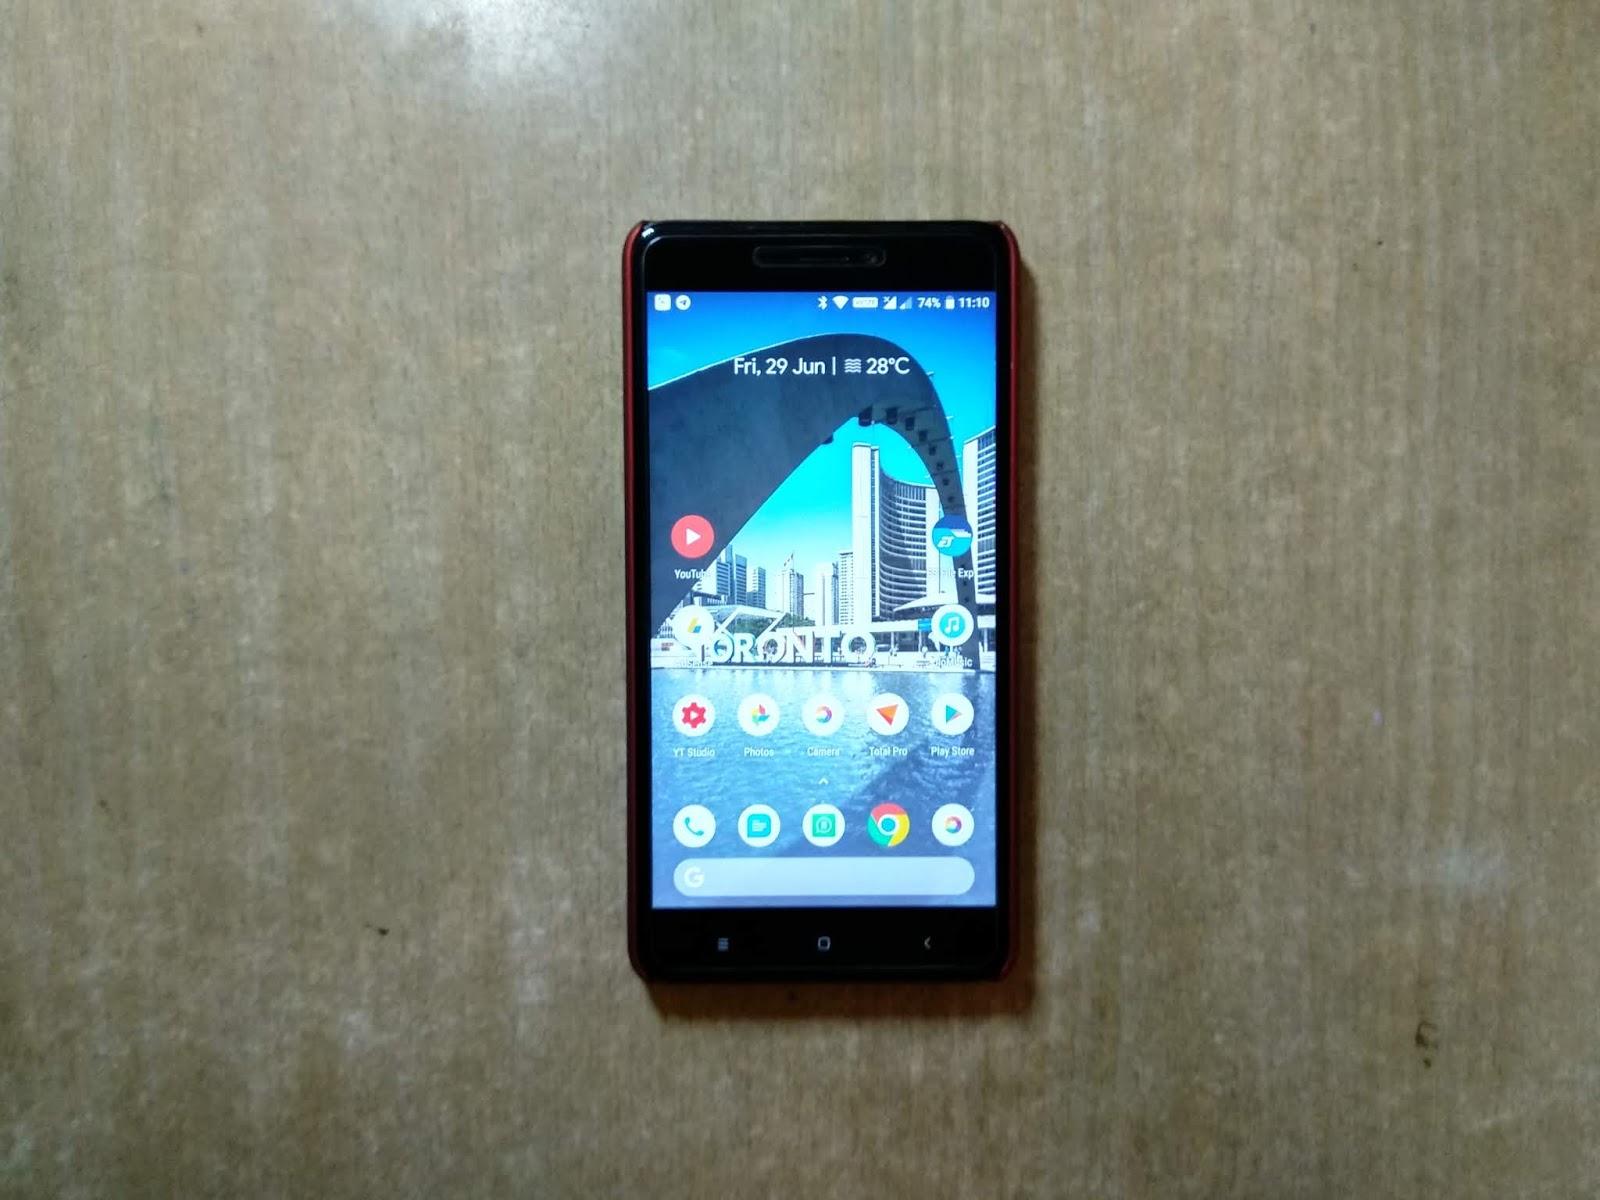 Android 8 1 Oreo Dot OS 2 3 1 For Xiaomi Redmi Note 4 (Mido